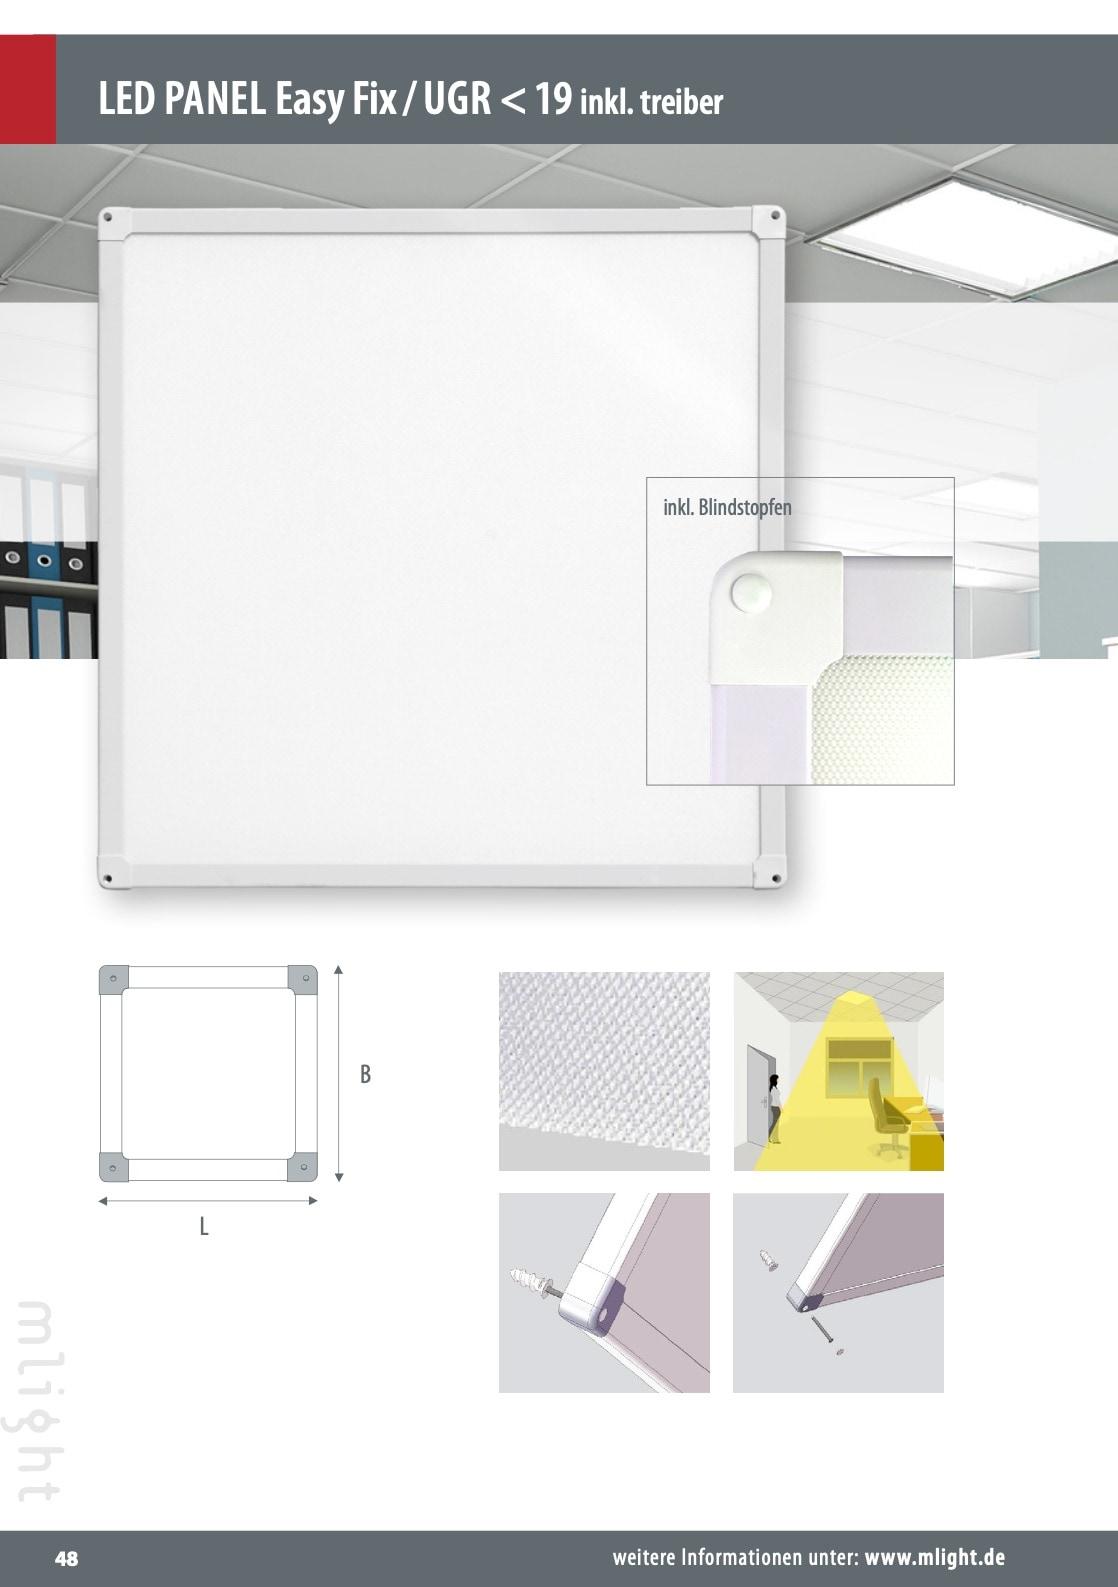 M-Light LED Deckananbau Panel UGR>19 625x625x34mm 40W 4000K 4000lm weiß 81-2091